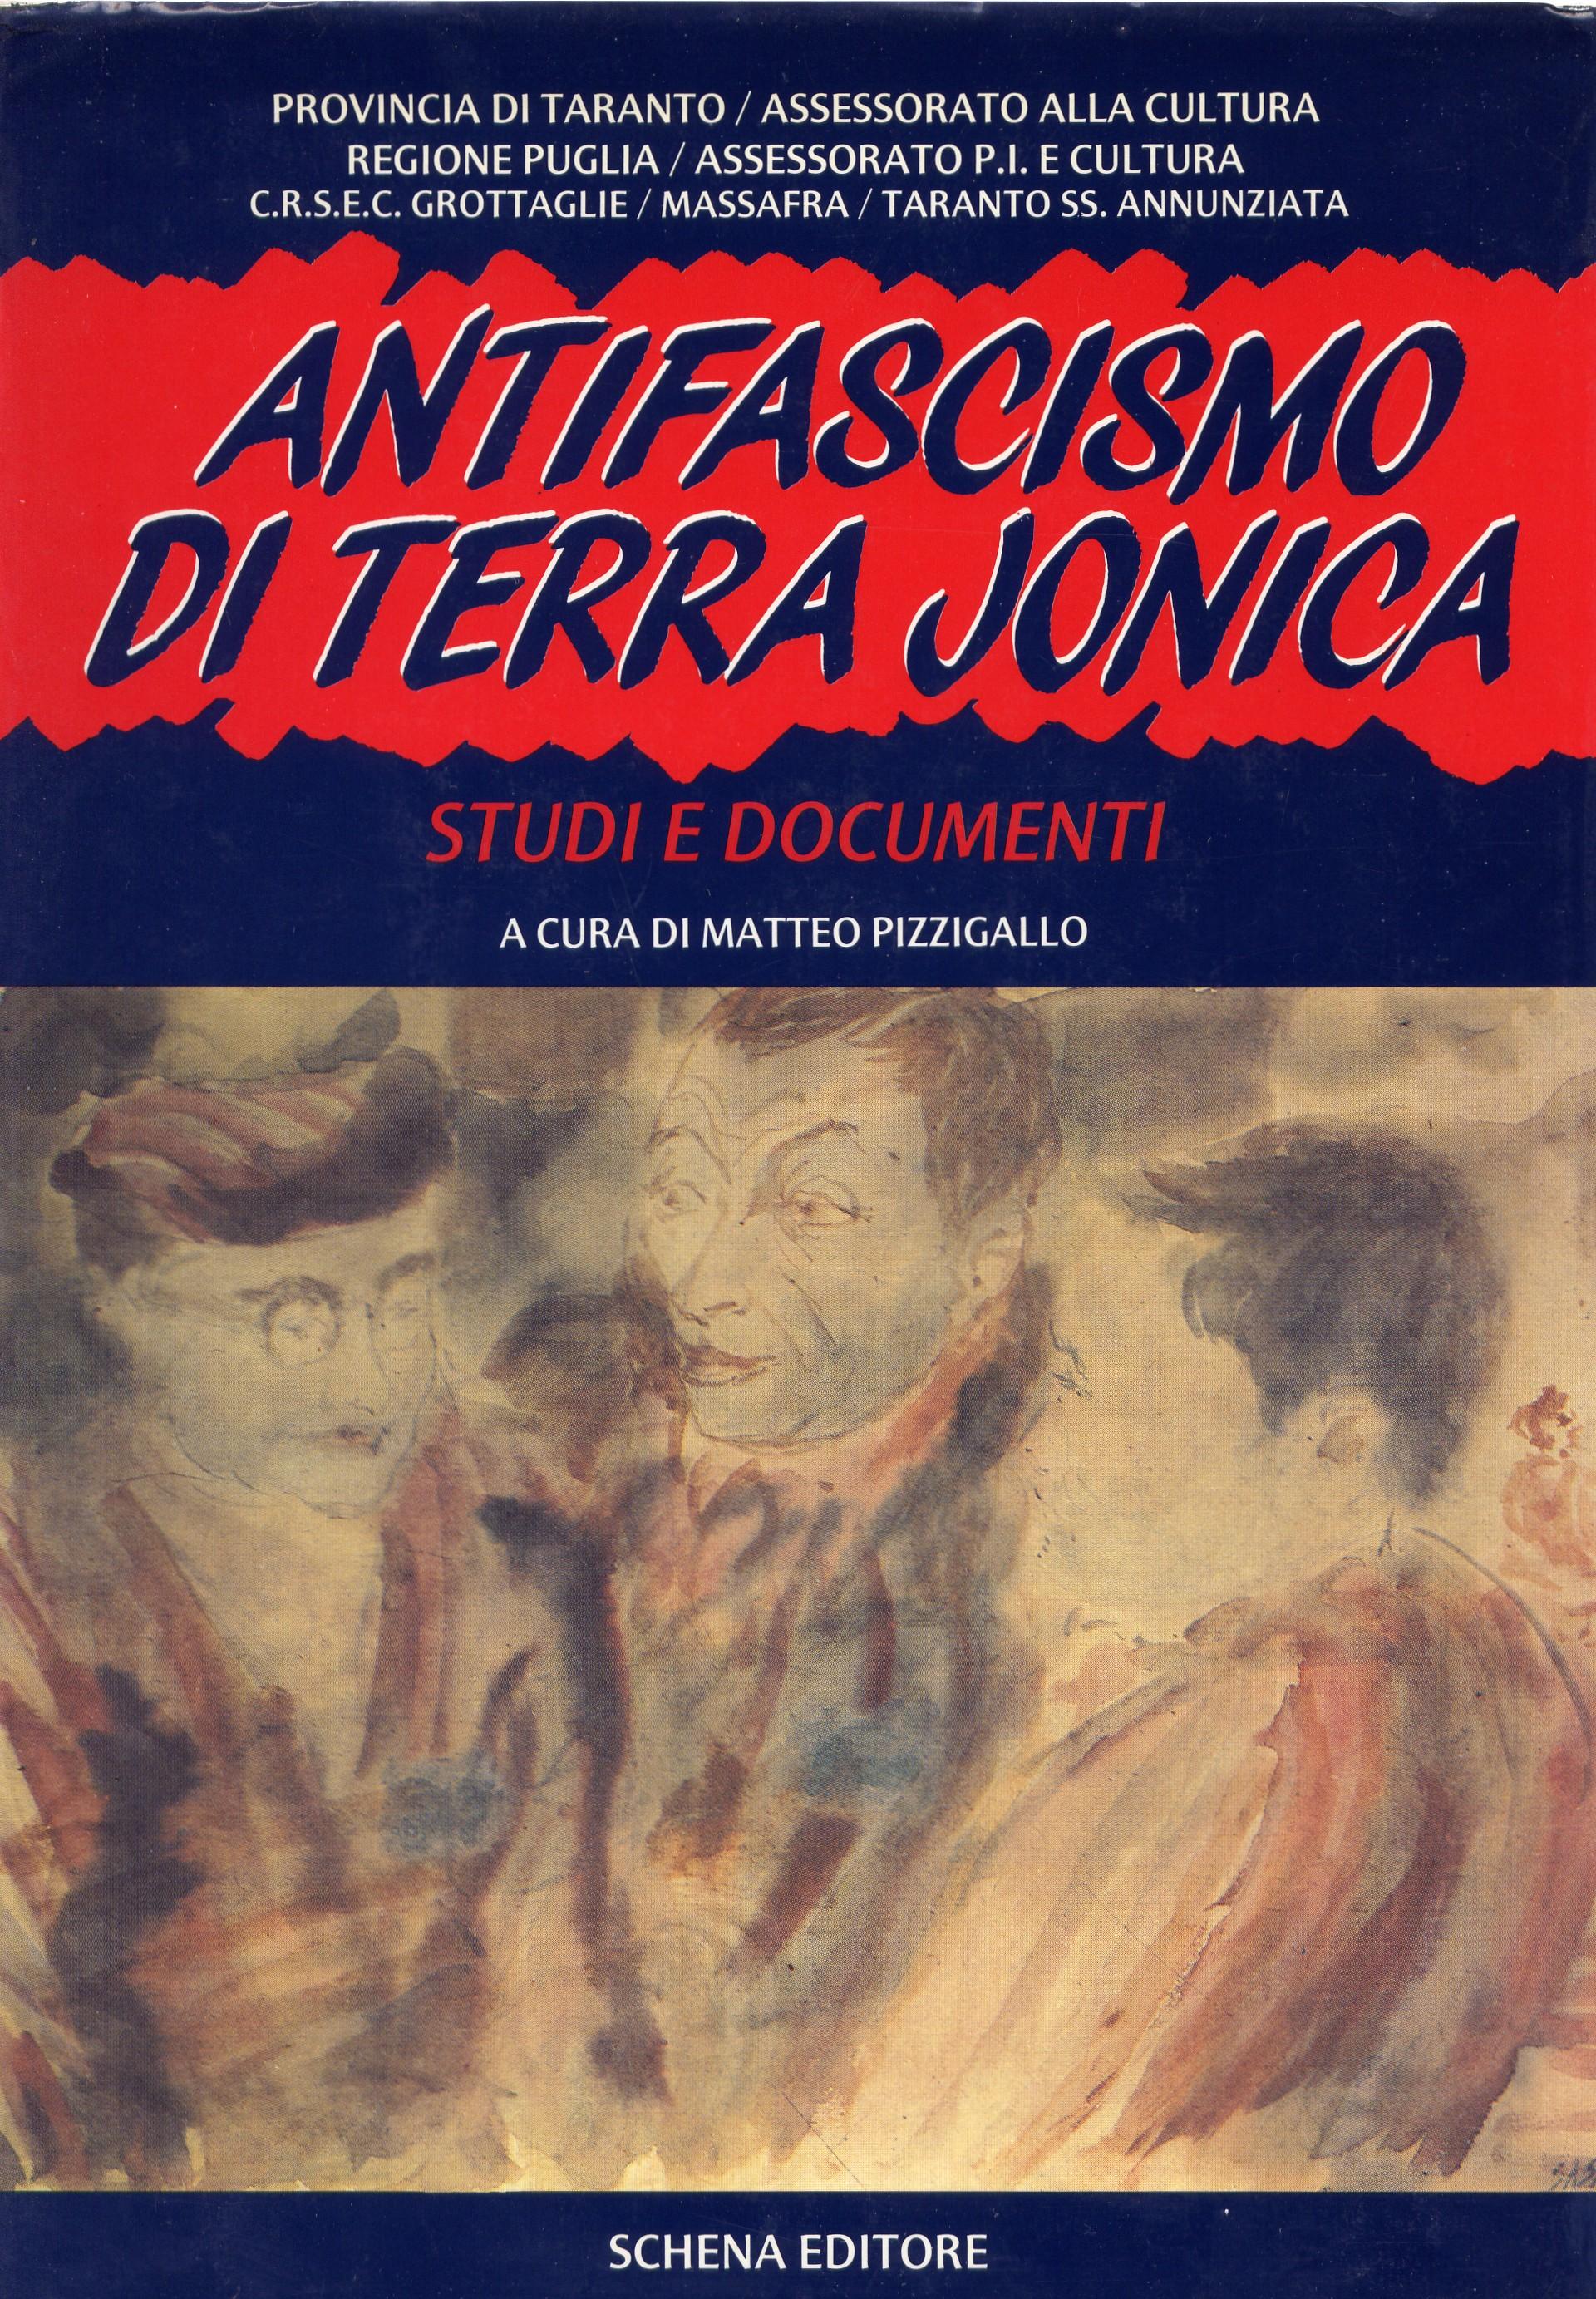 Antifascismo di terra jonica